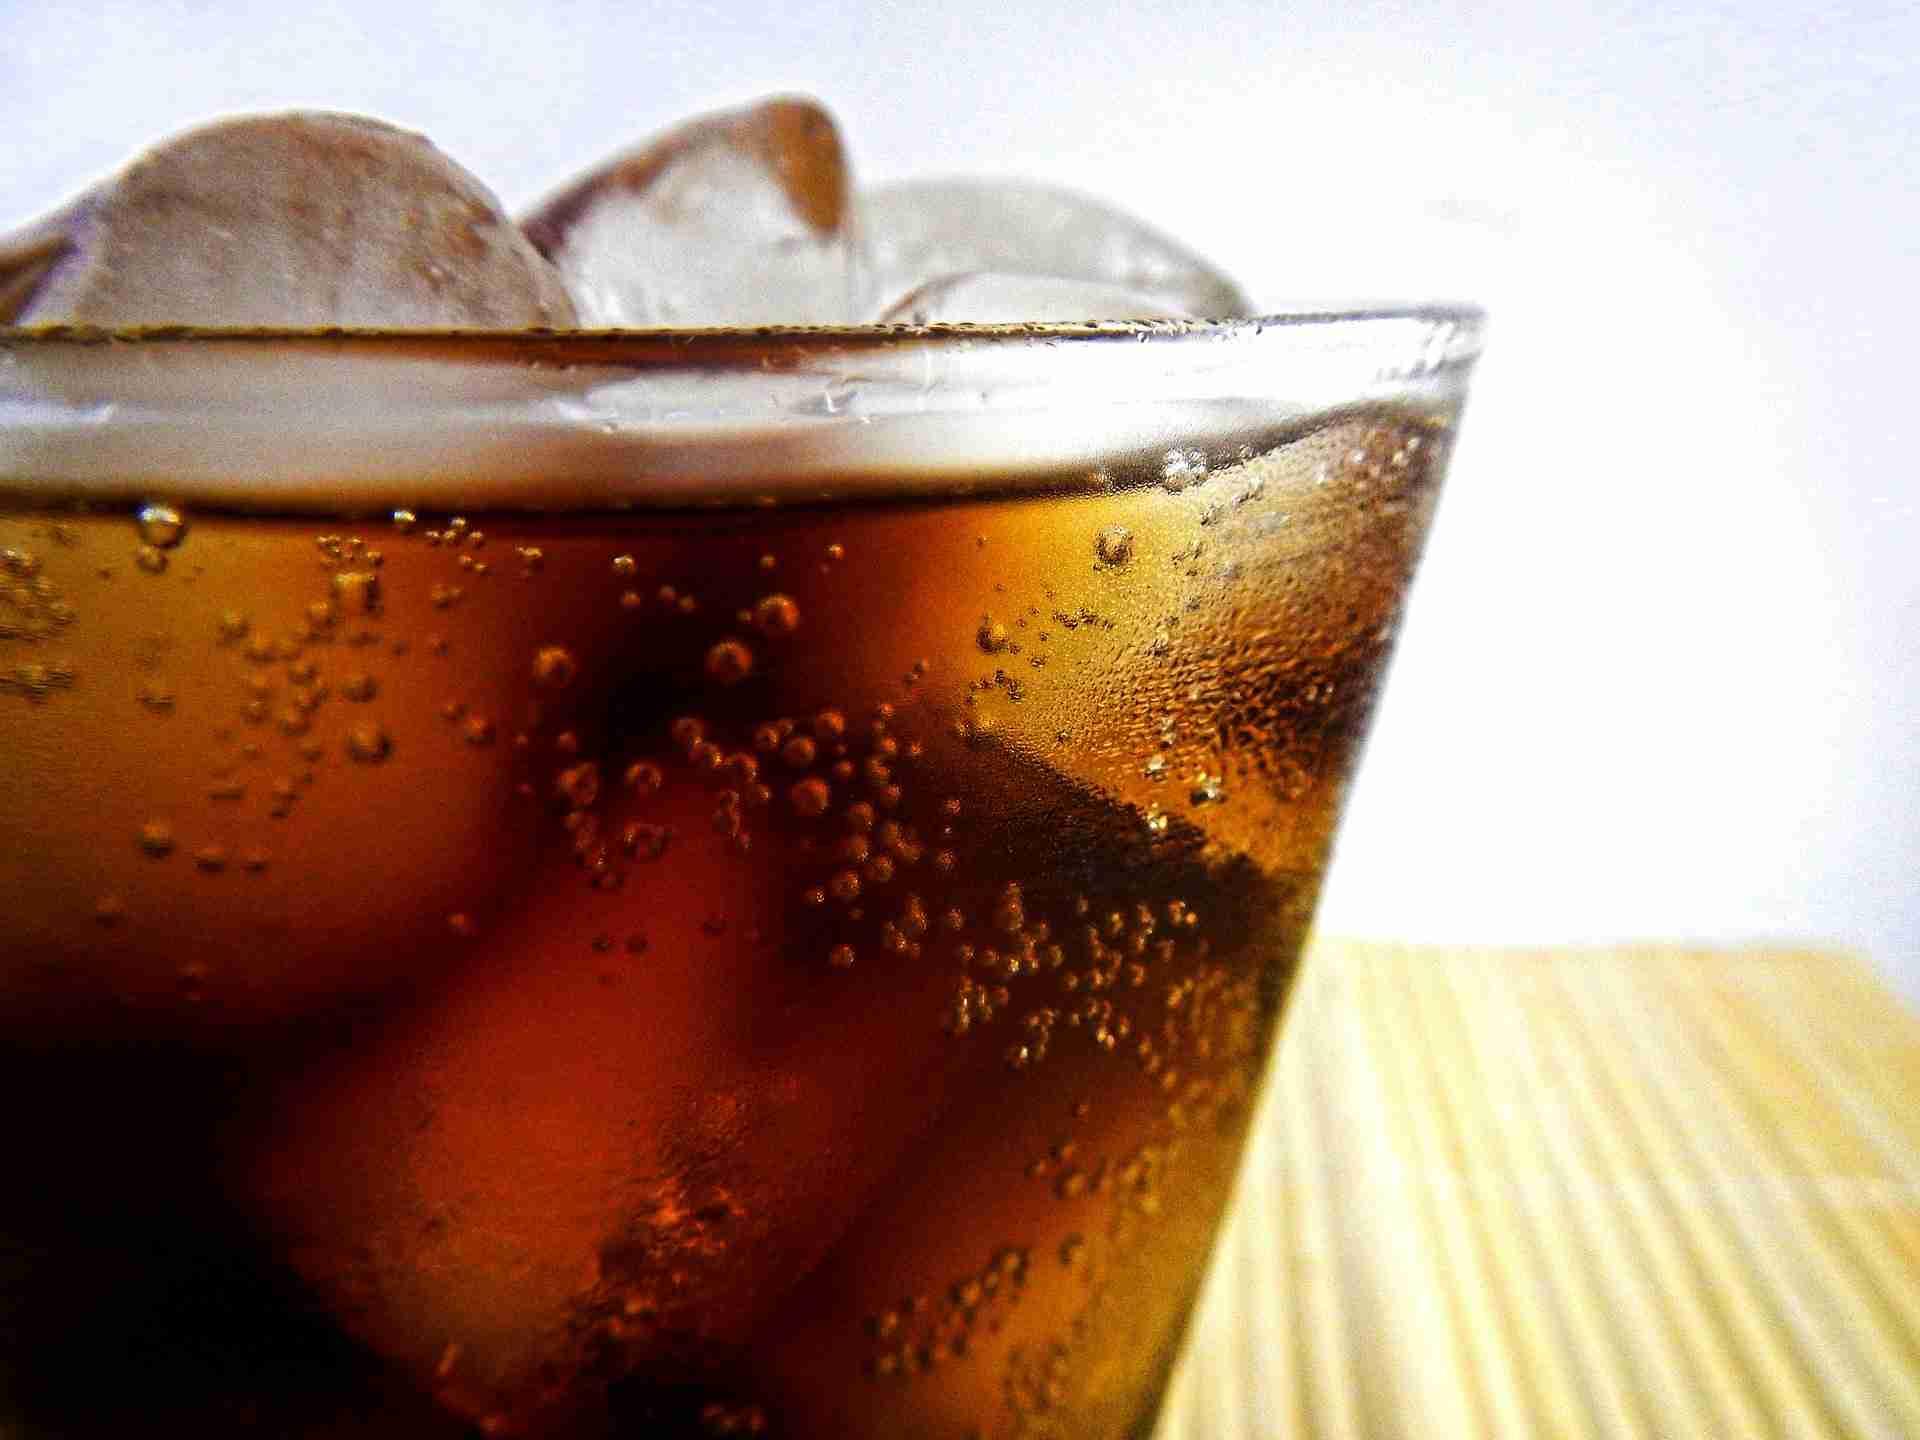 Cola als Putzmittel